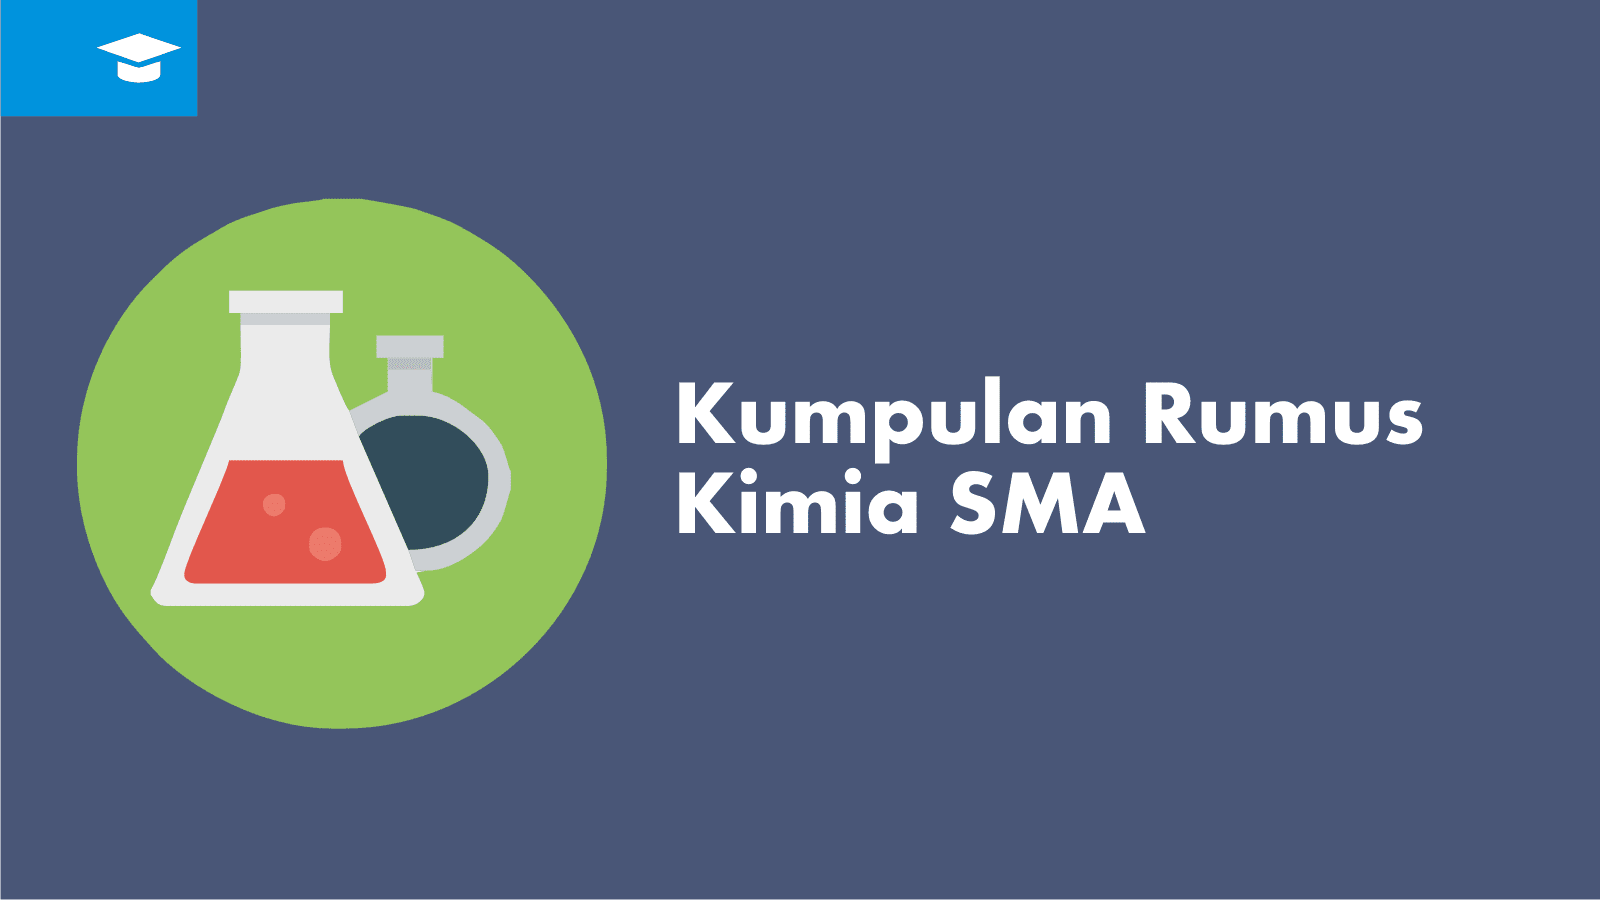 Kumpulan Rumus Kimia SMA